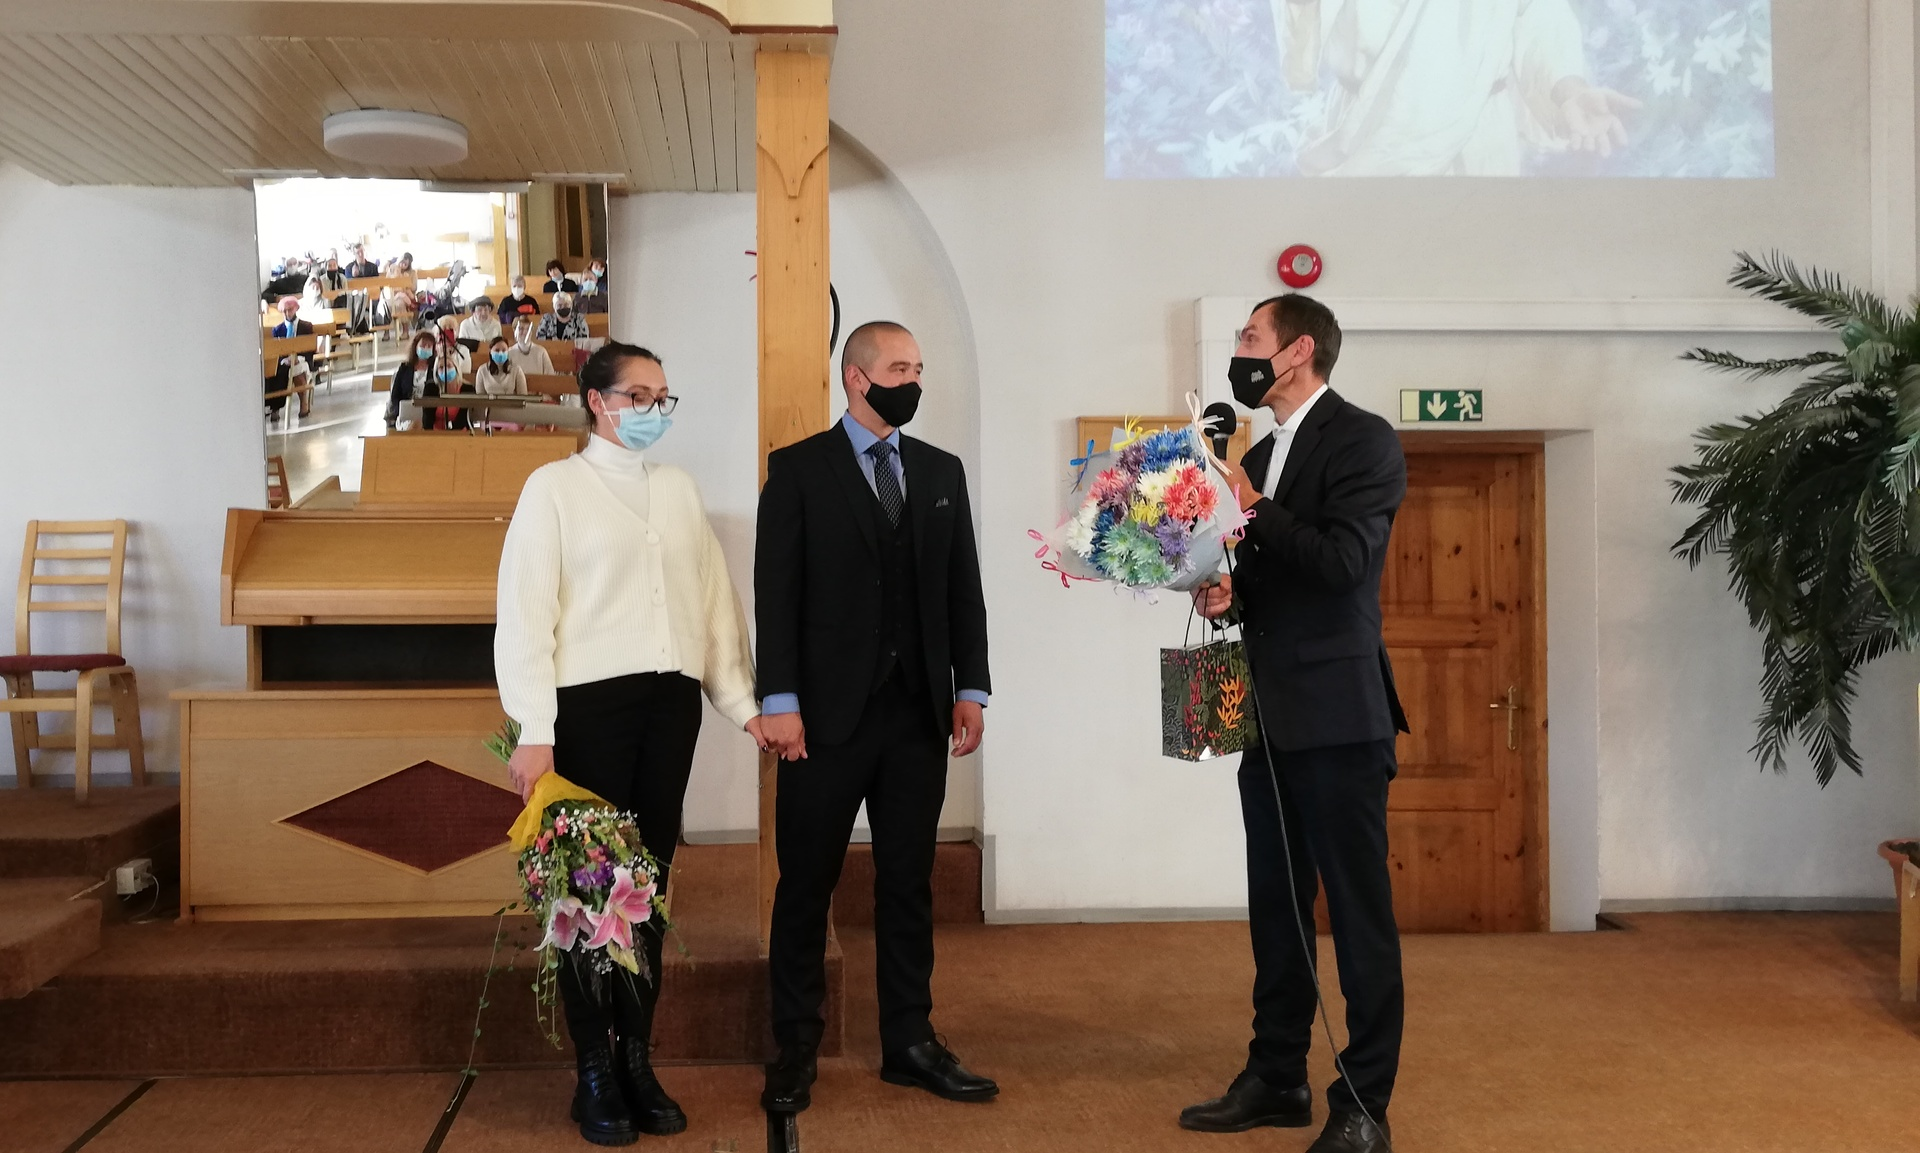 Tallinna III kogudus tervitas uut pastorit